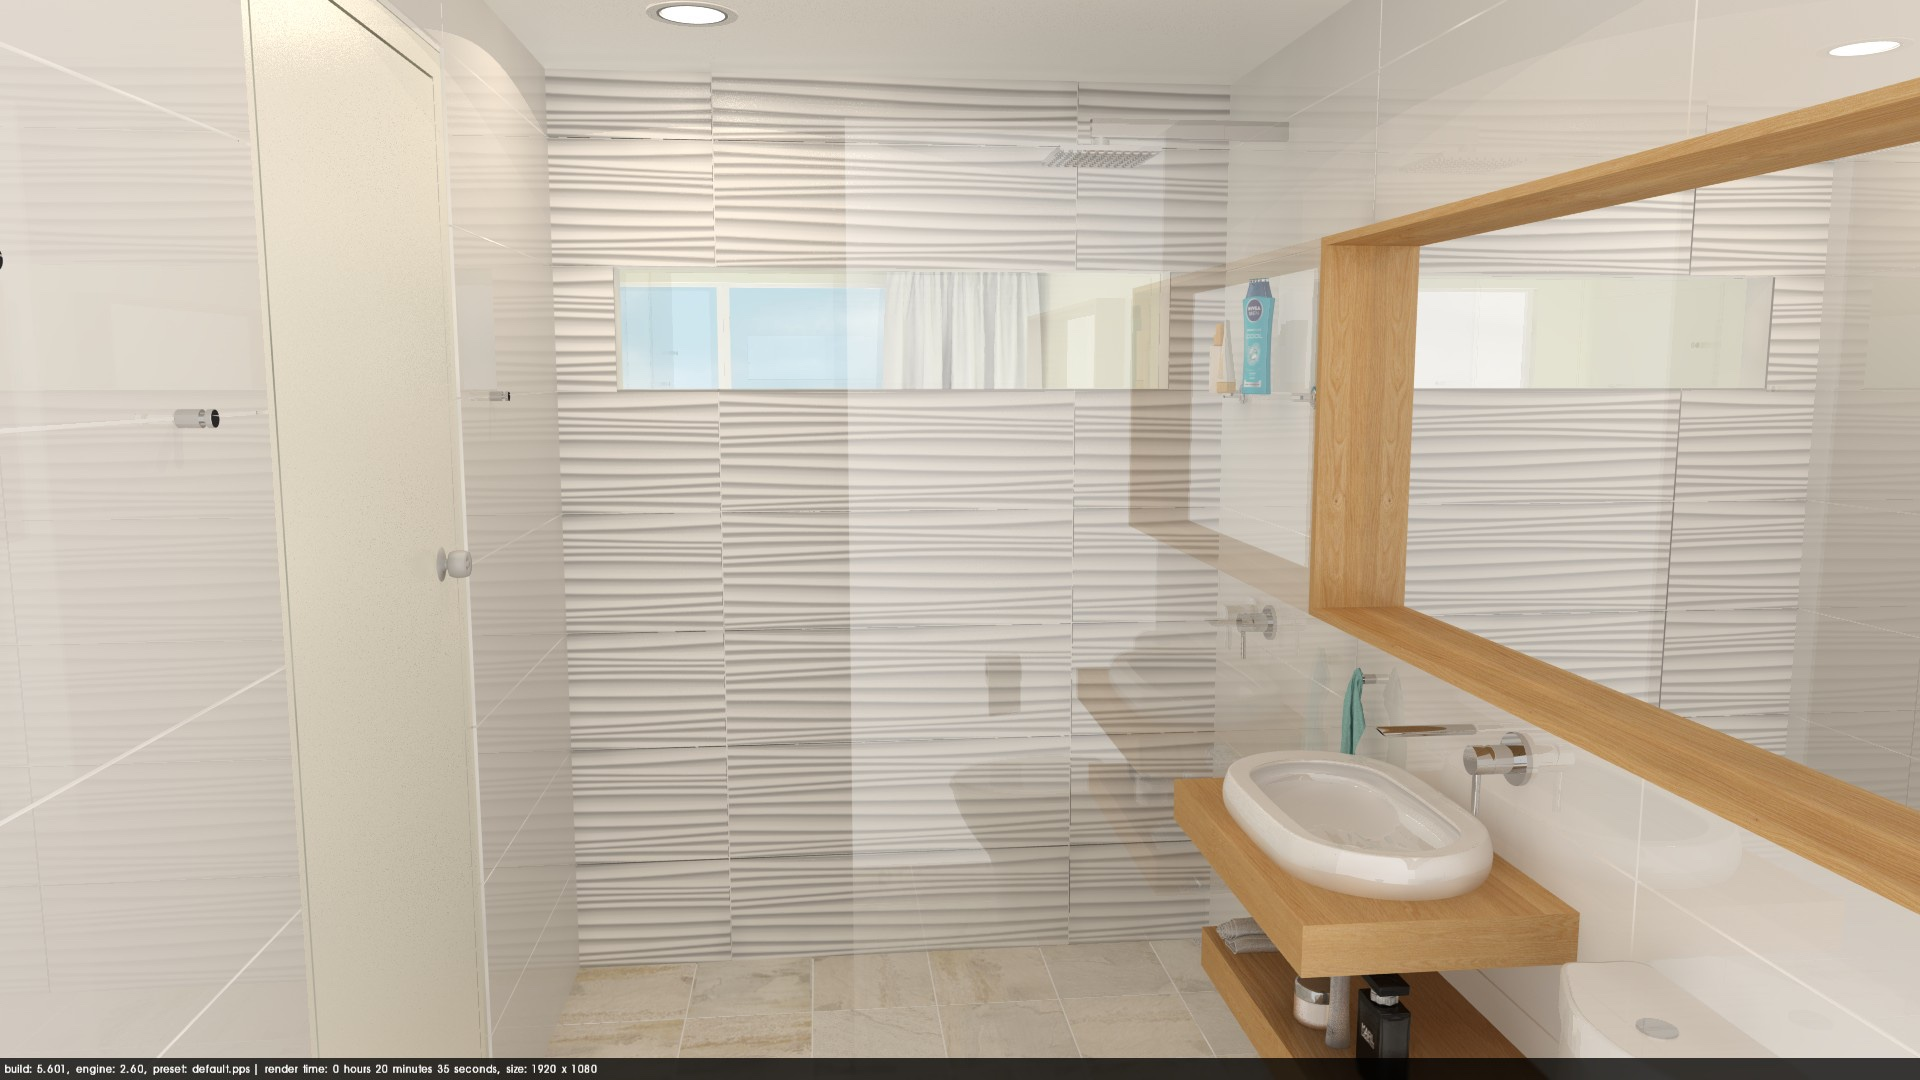 Noahs - bathroom - Premier 2017-08-28 20451400000.jpg